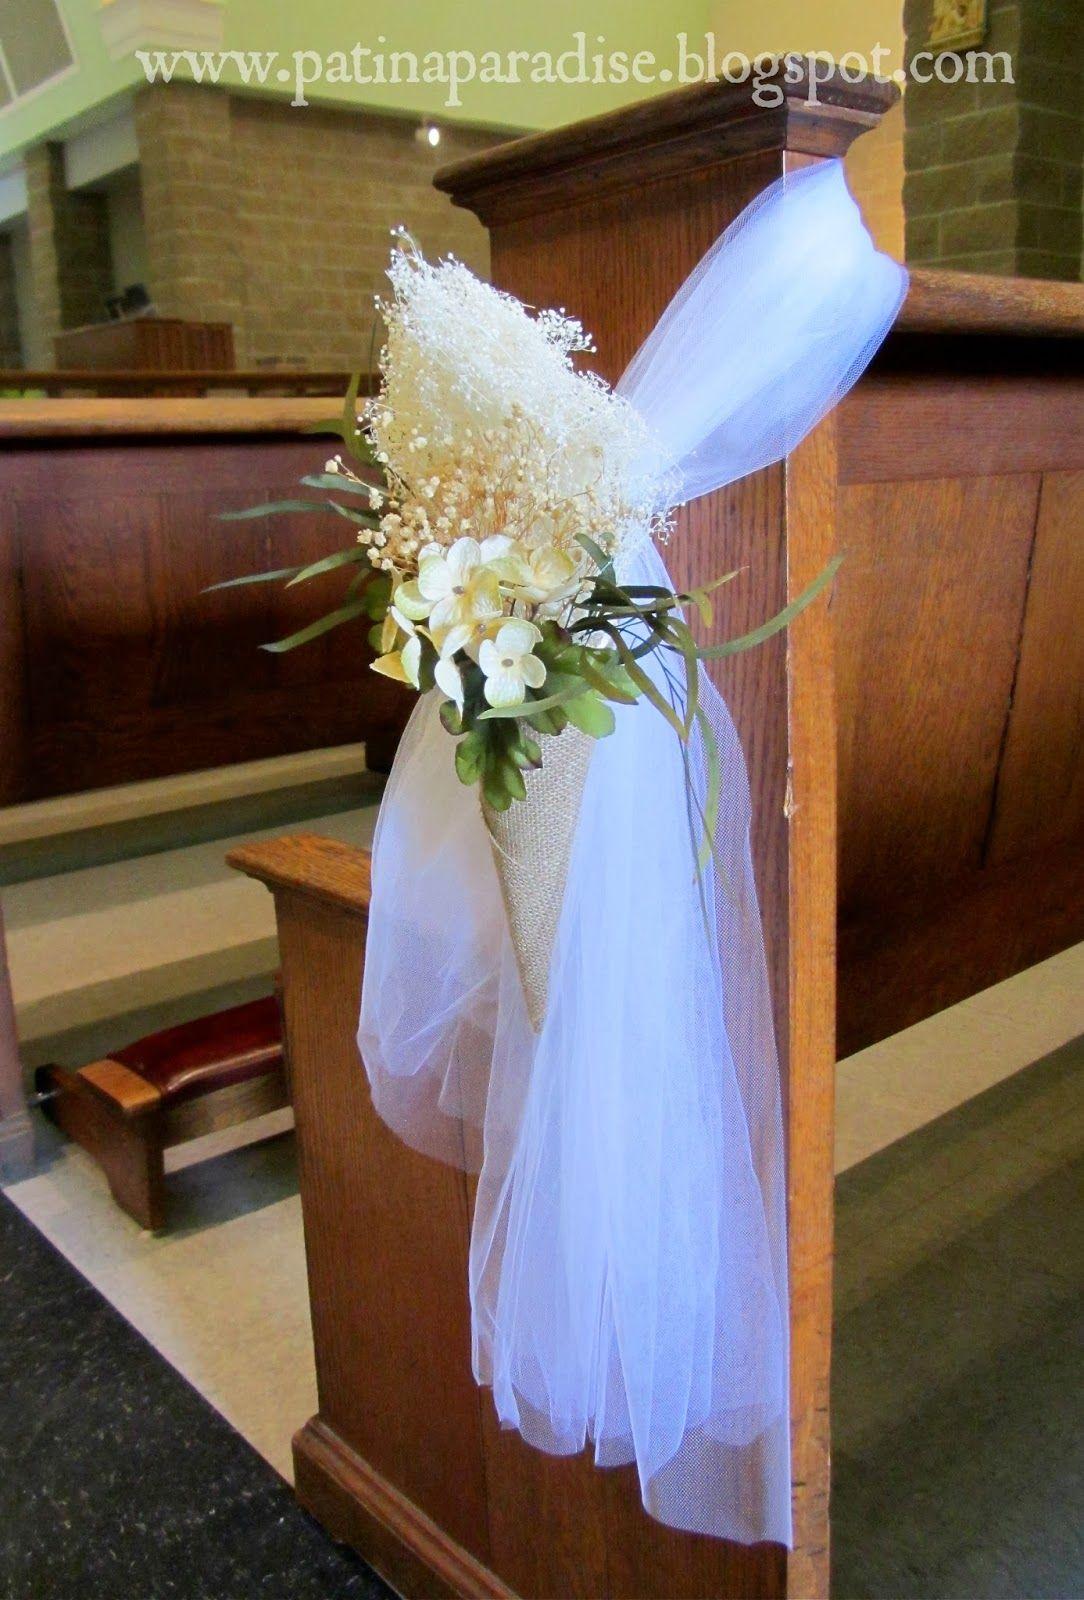 Fall Wedding Ideas: DIY Reception Table Decor | @ Pew Bows 4 Karen ...